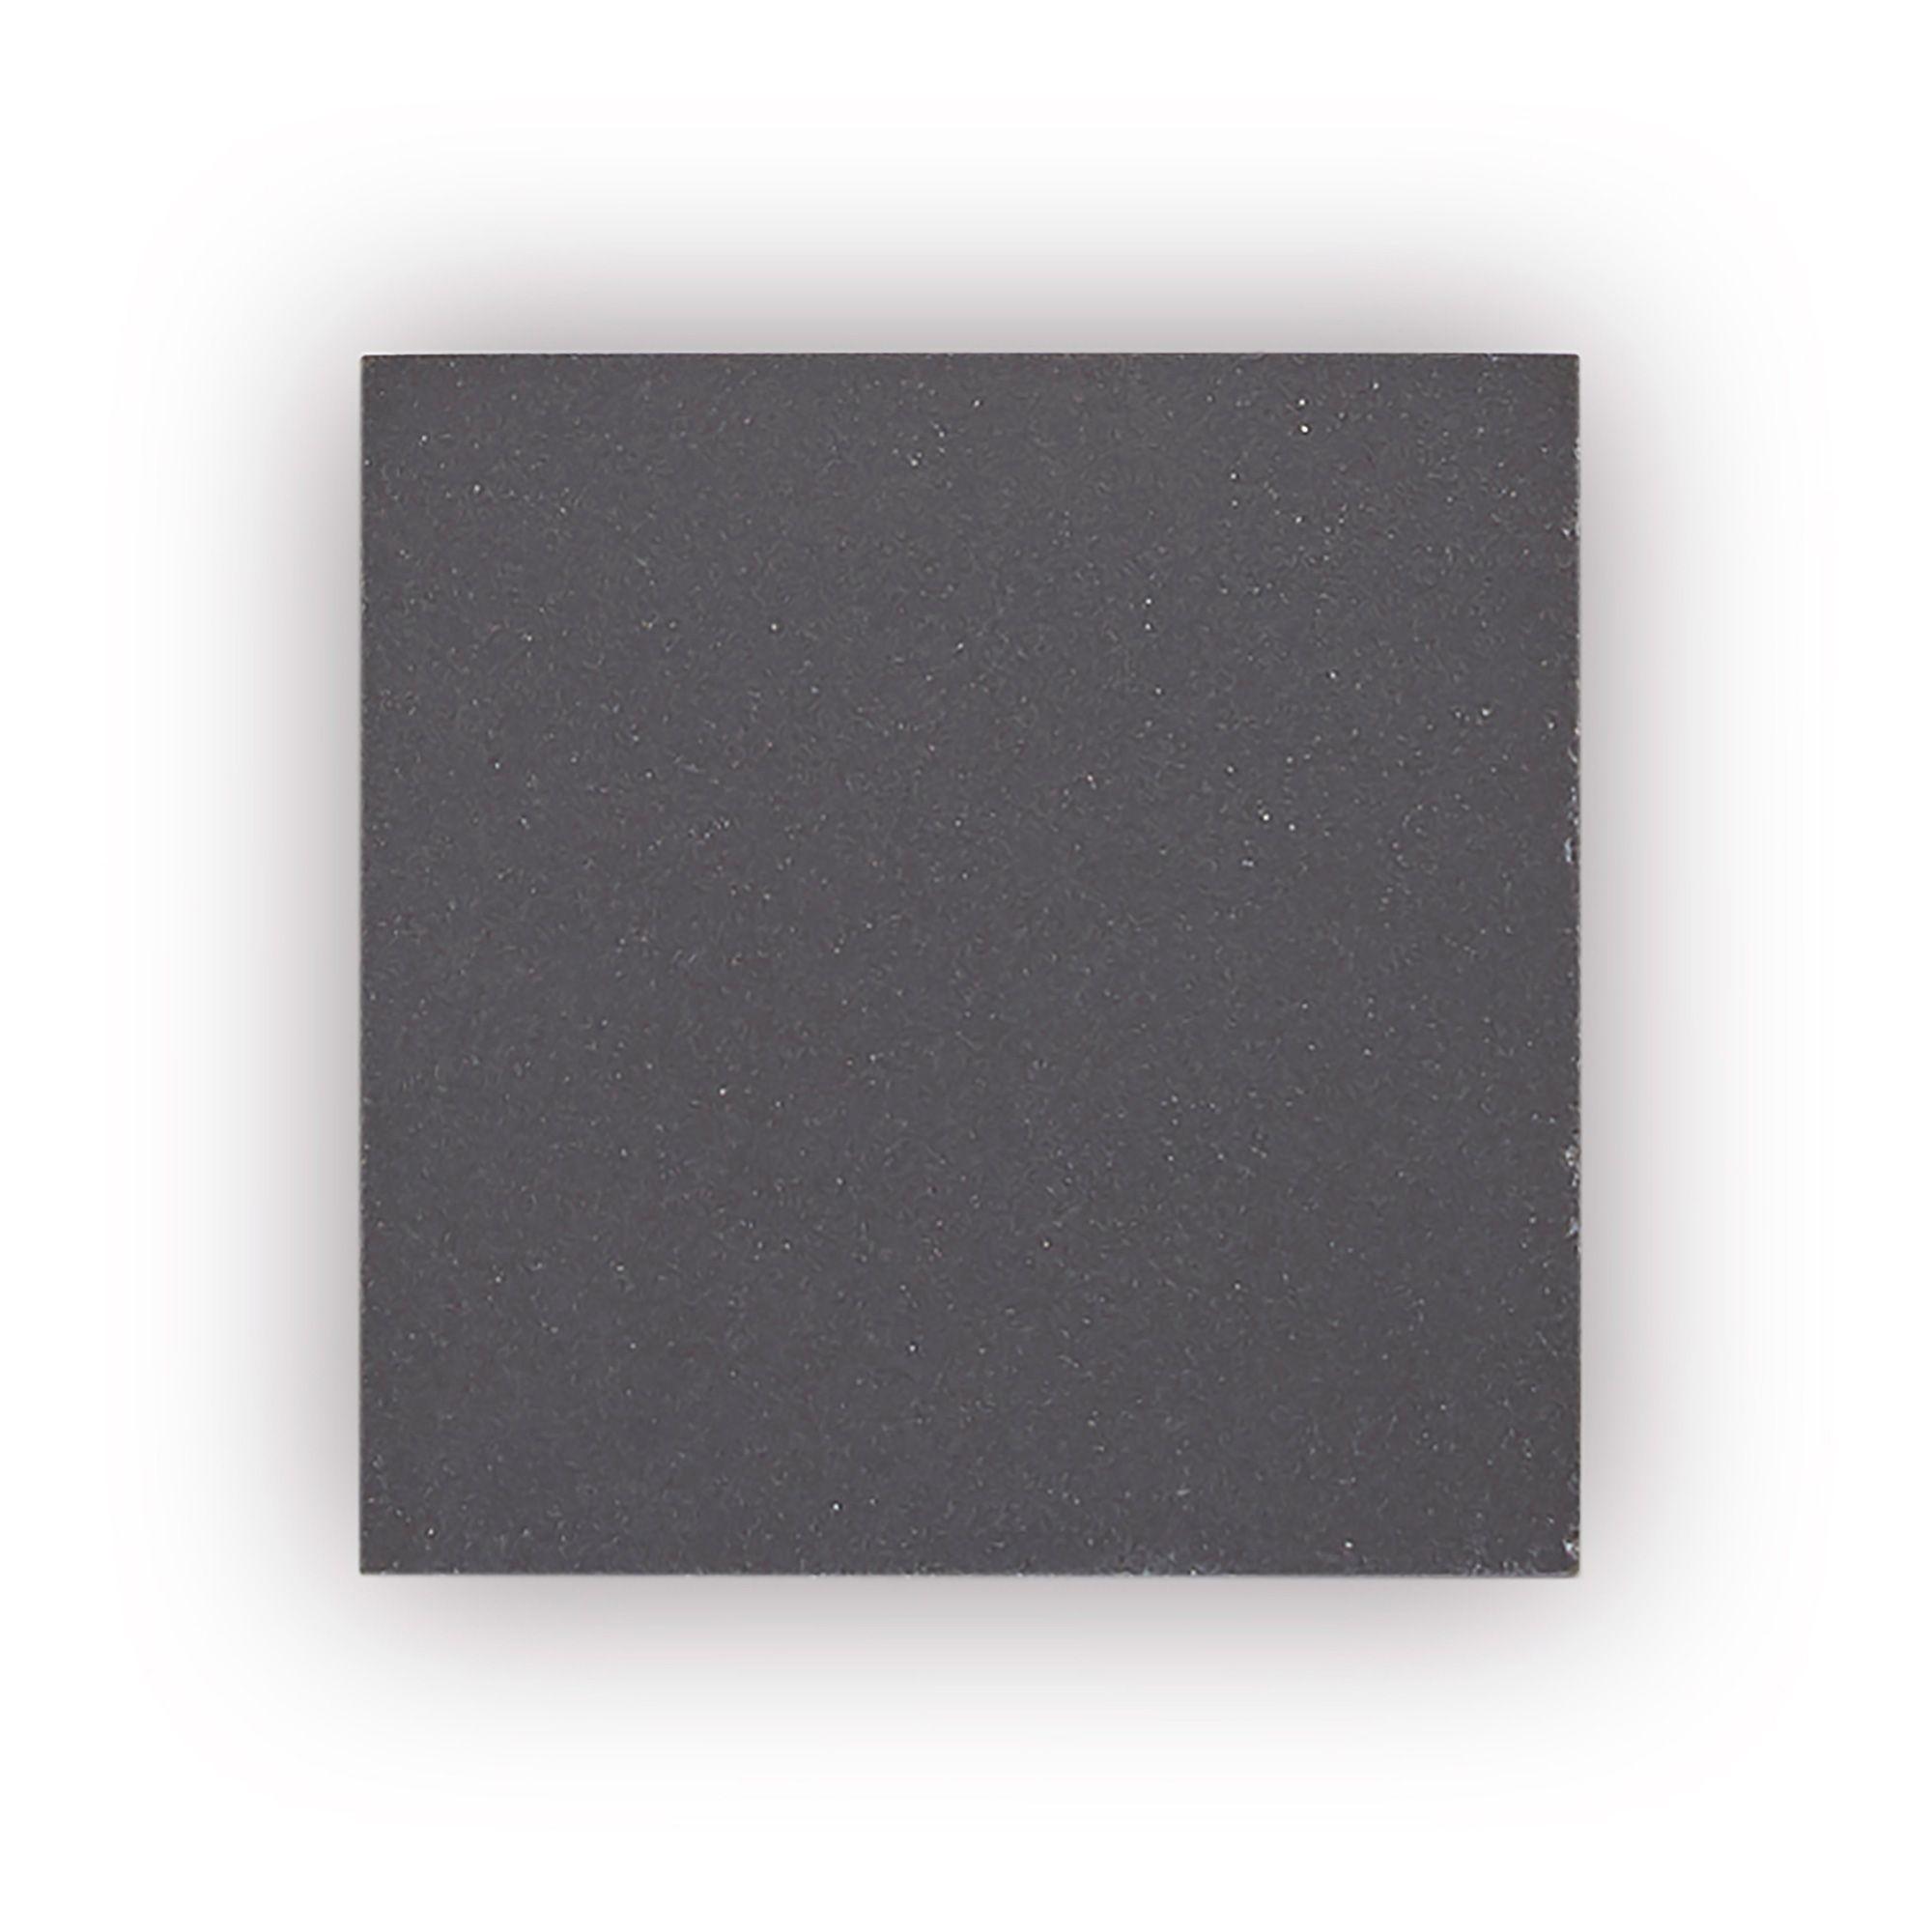 Geometric Black Inset